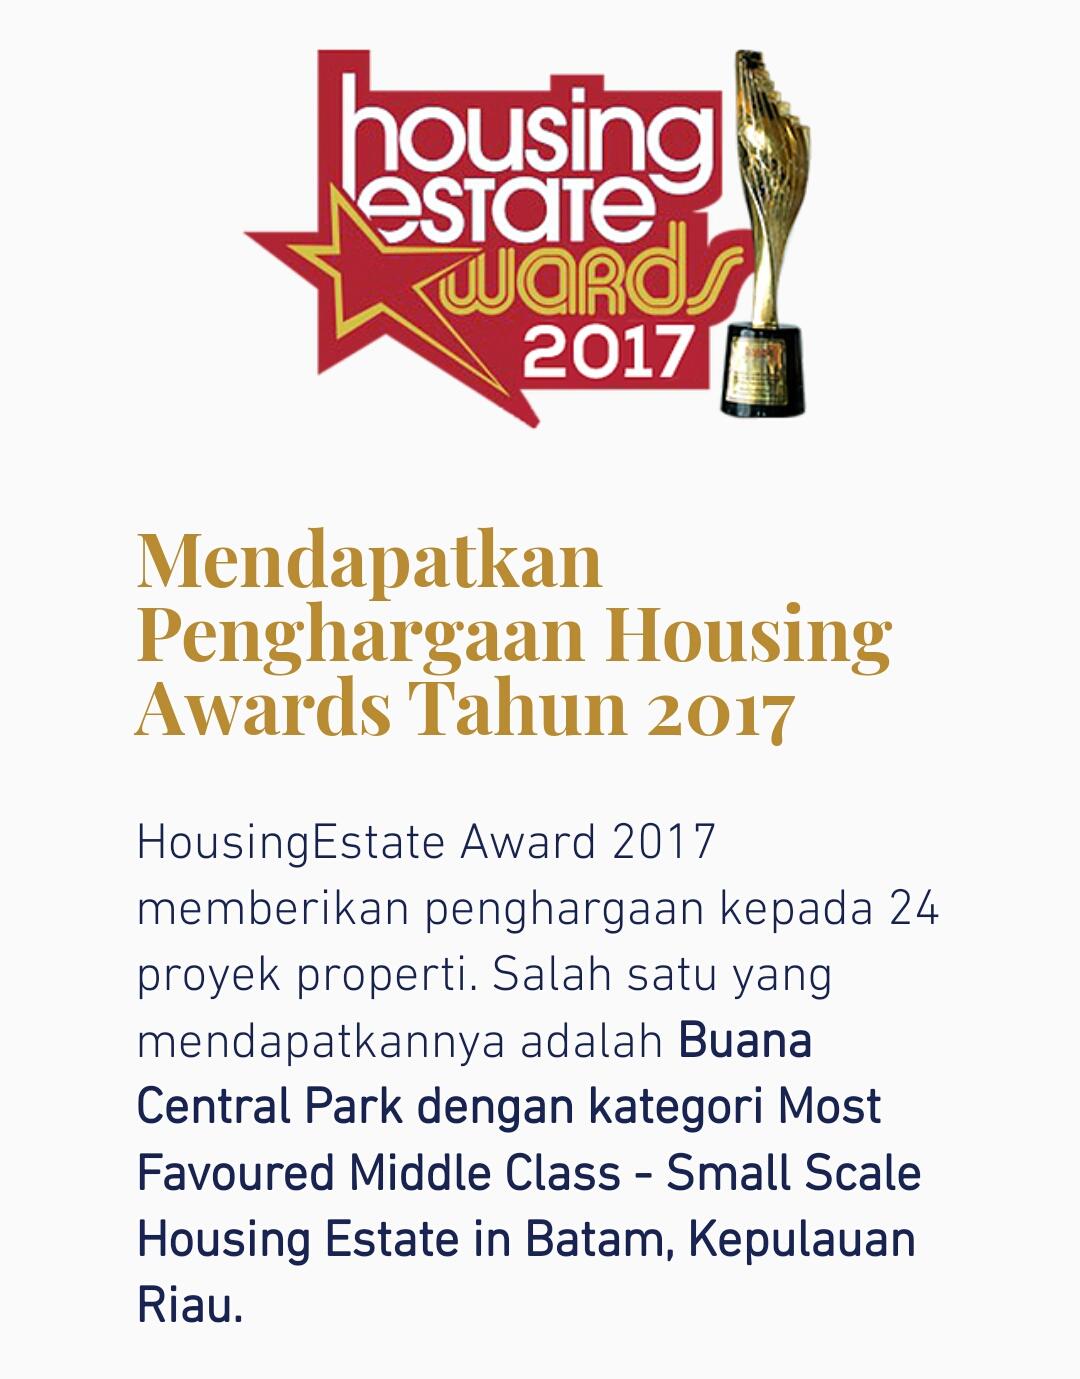 Perumahan Buana Central Park mendapatkan Penghargaan dengan kategori Most Favoured Middle Class - Small Scale Housing Estate in Batam, Kepulauan Riau.